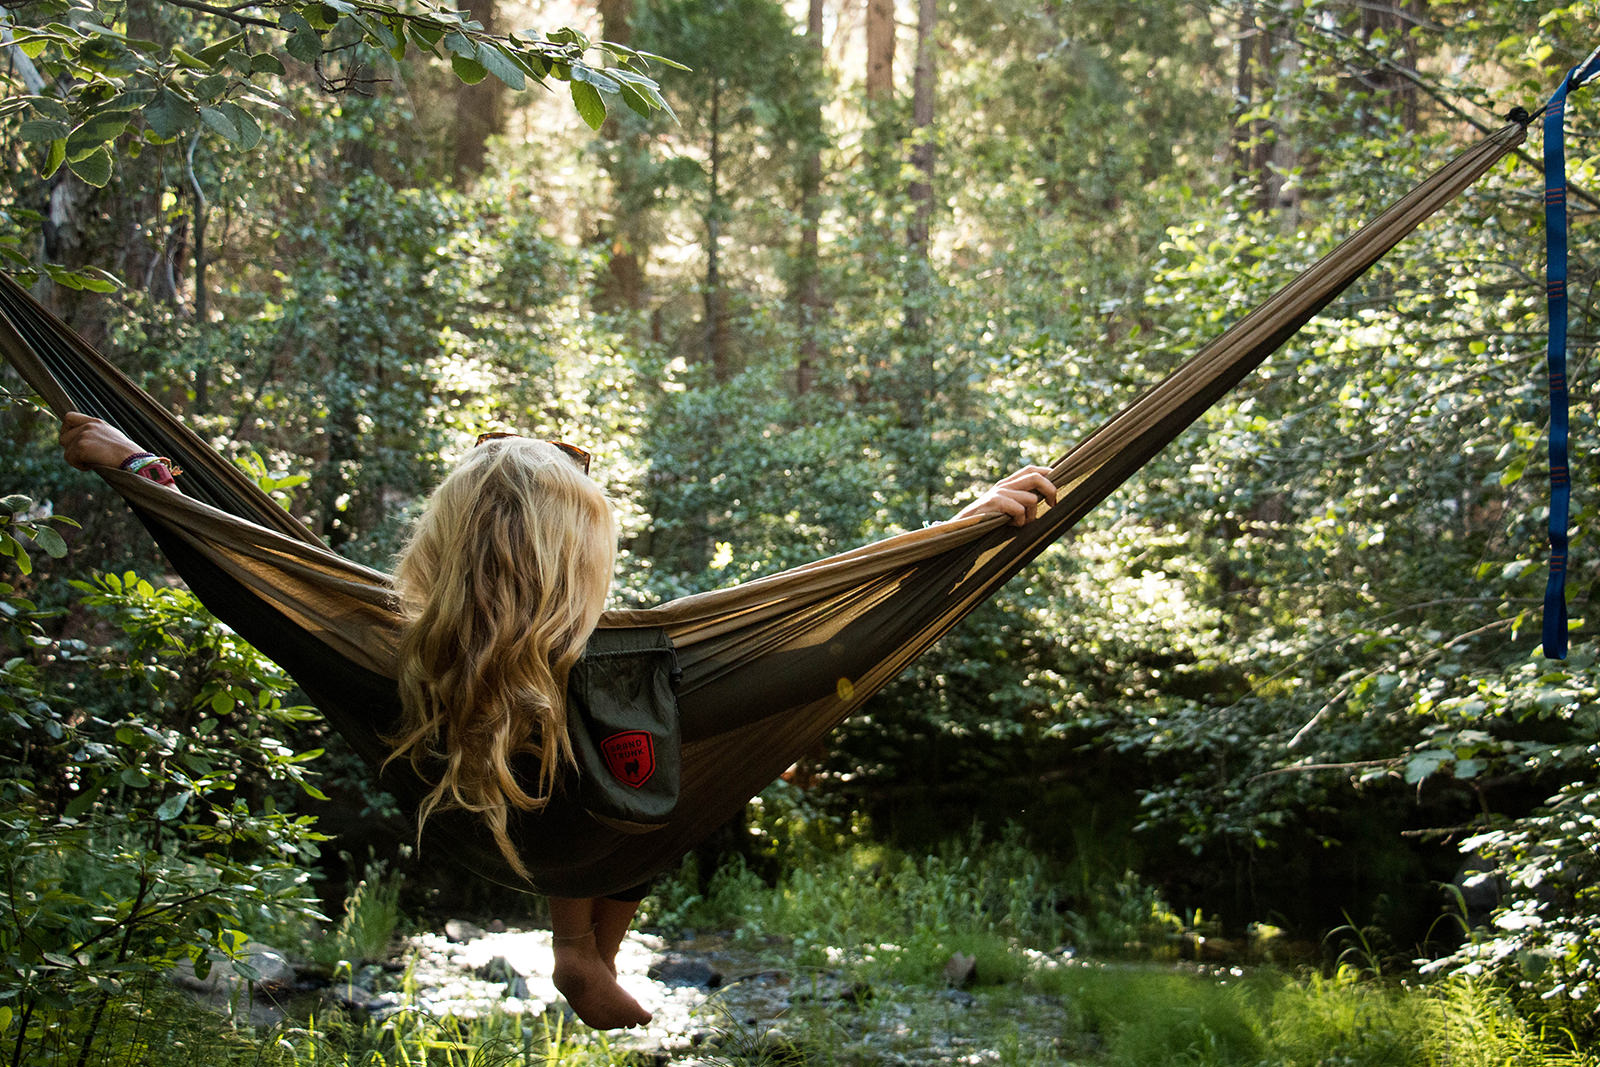 grand trunk double parachute nylon hammock outdoor camping  grand trunk double parachute nylon hammock outdoor camping travel      rh   ebay